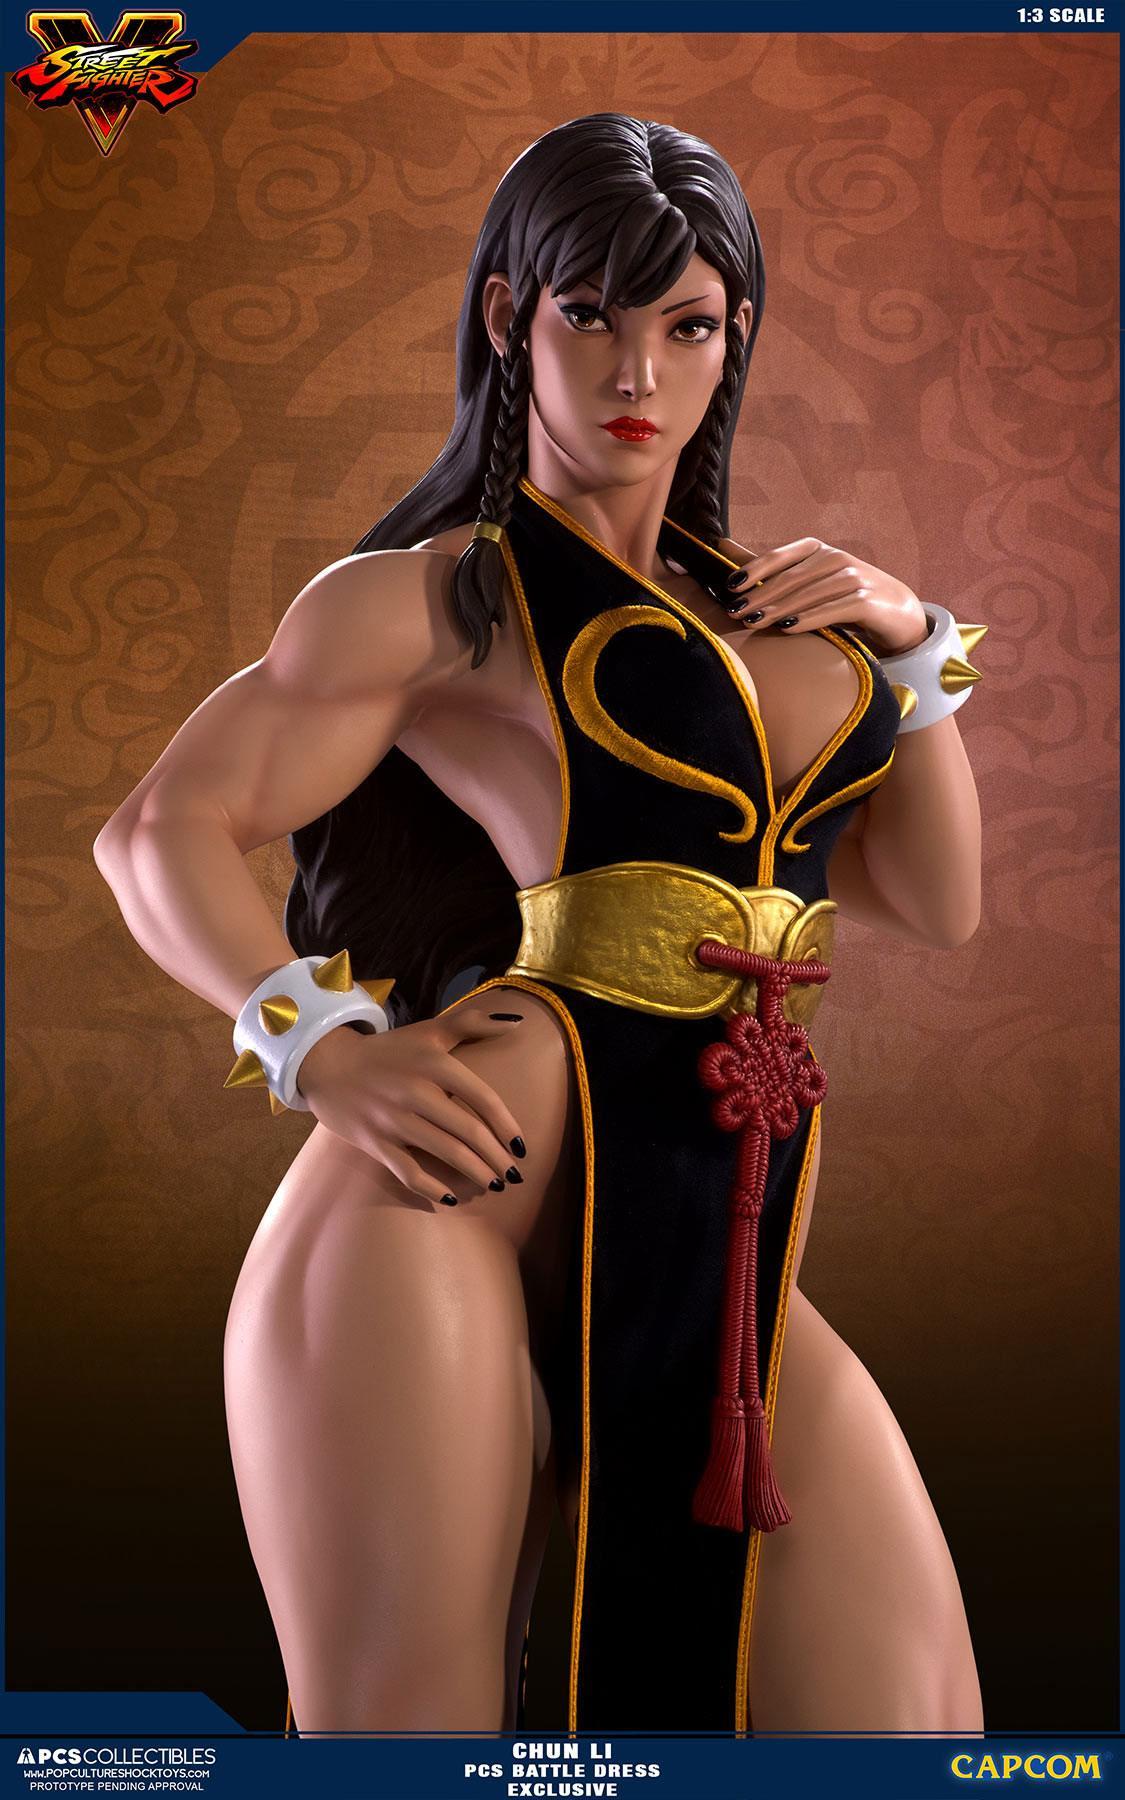 Street Fighter V Statue 1 3 Chun Li Battle Dress Exclusive 73 Cm